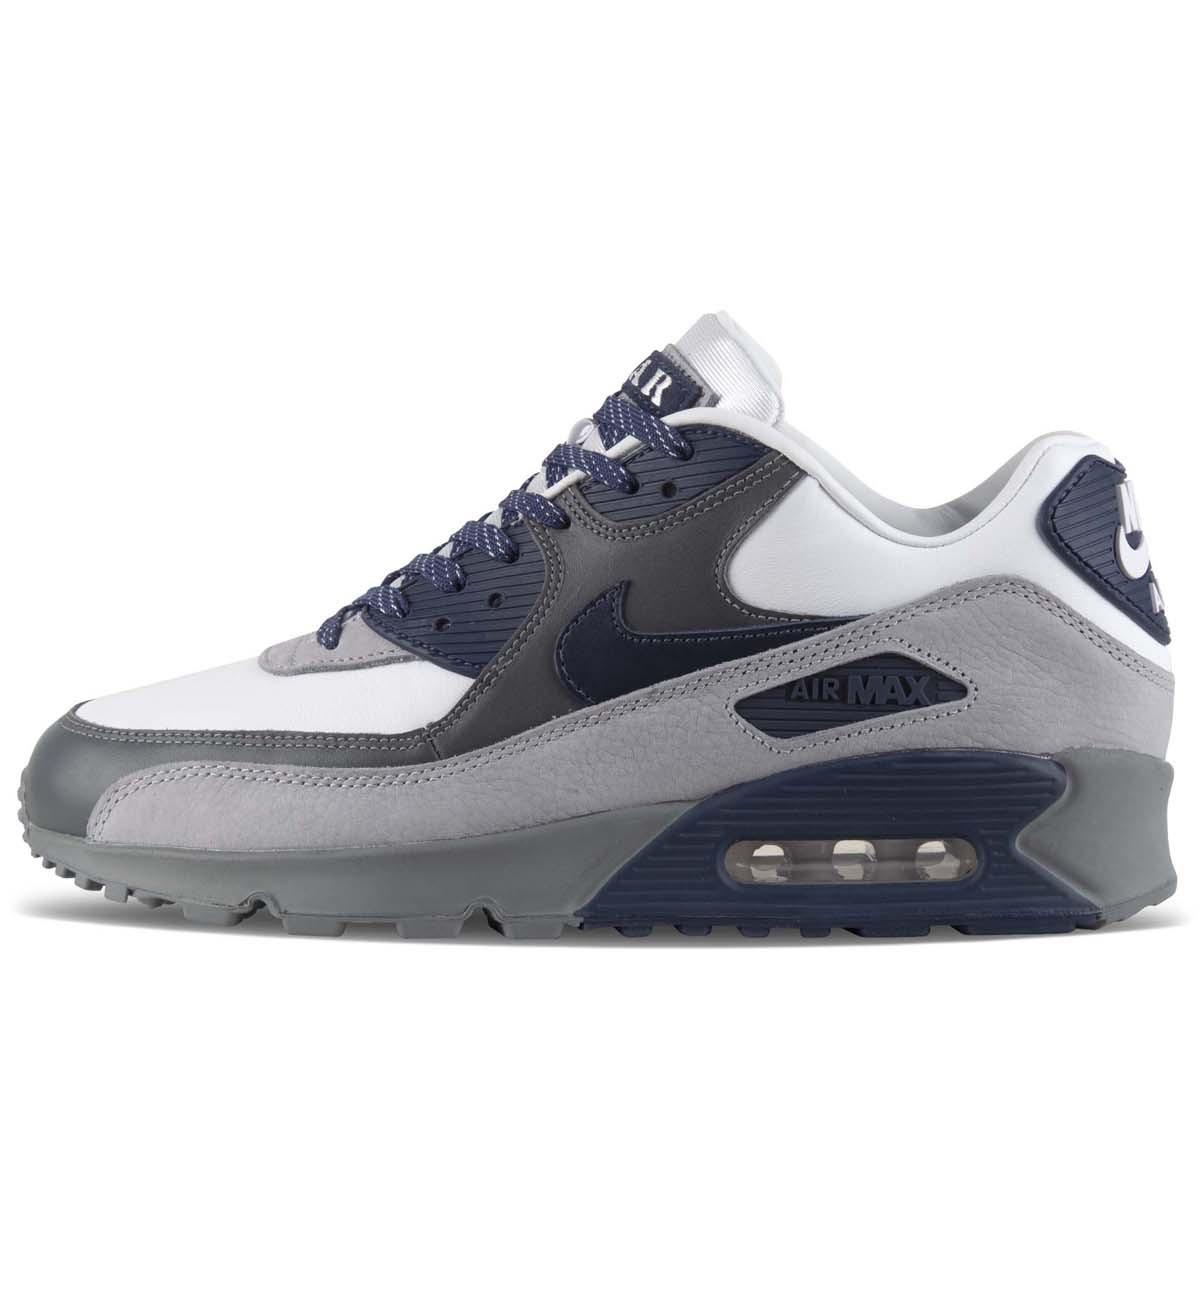 30% discount on the Nike Air Max 90 'Lahar Escape' £83.29 @ 5 Pointz